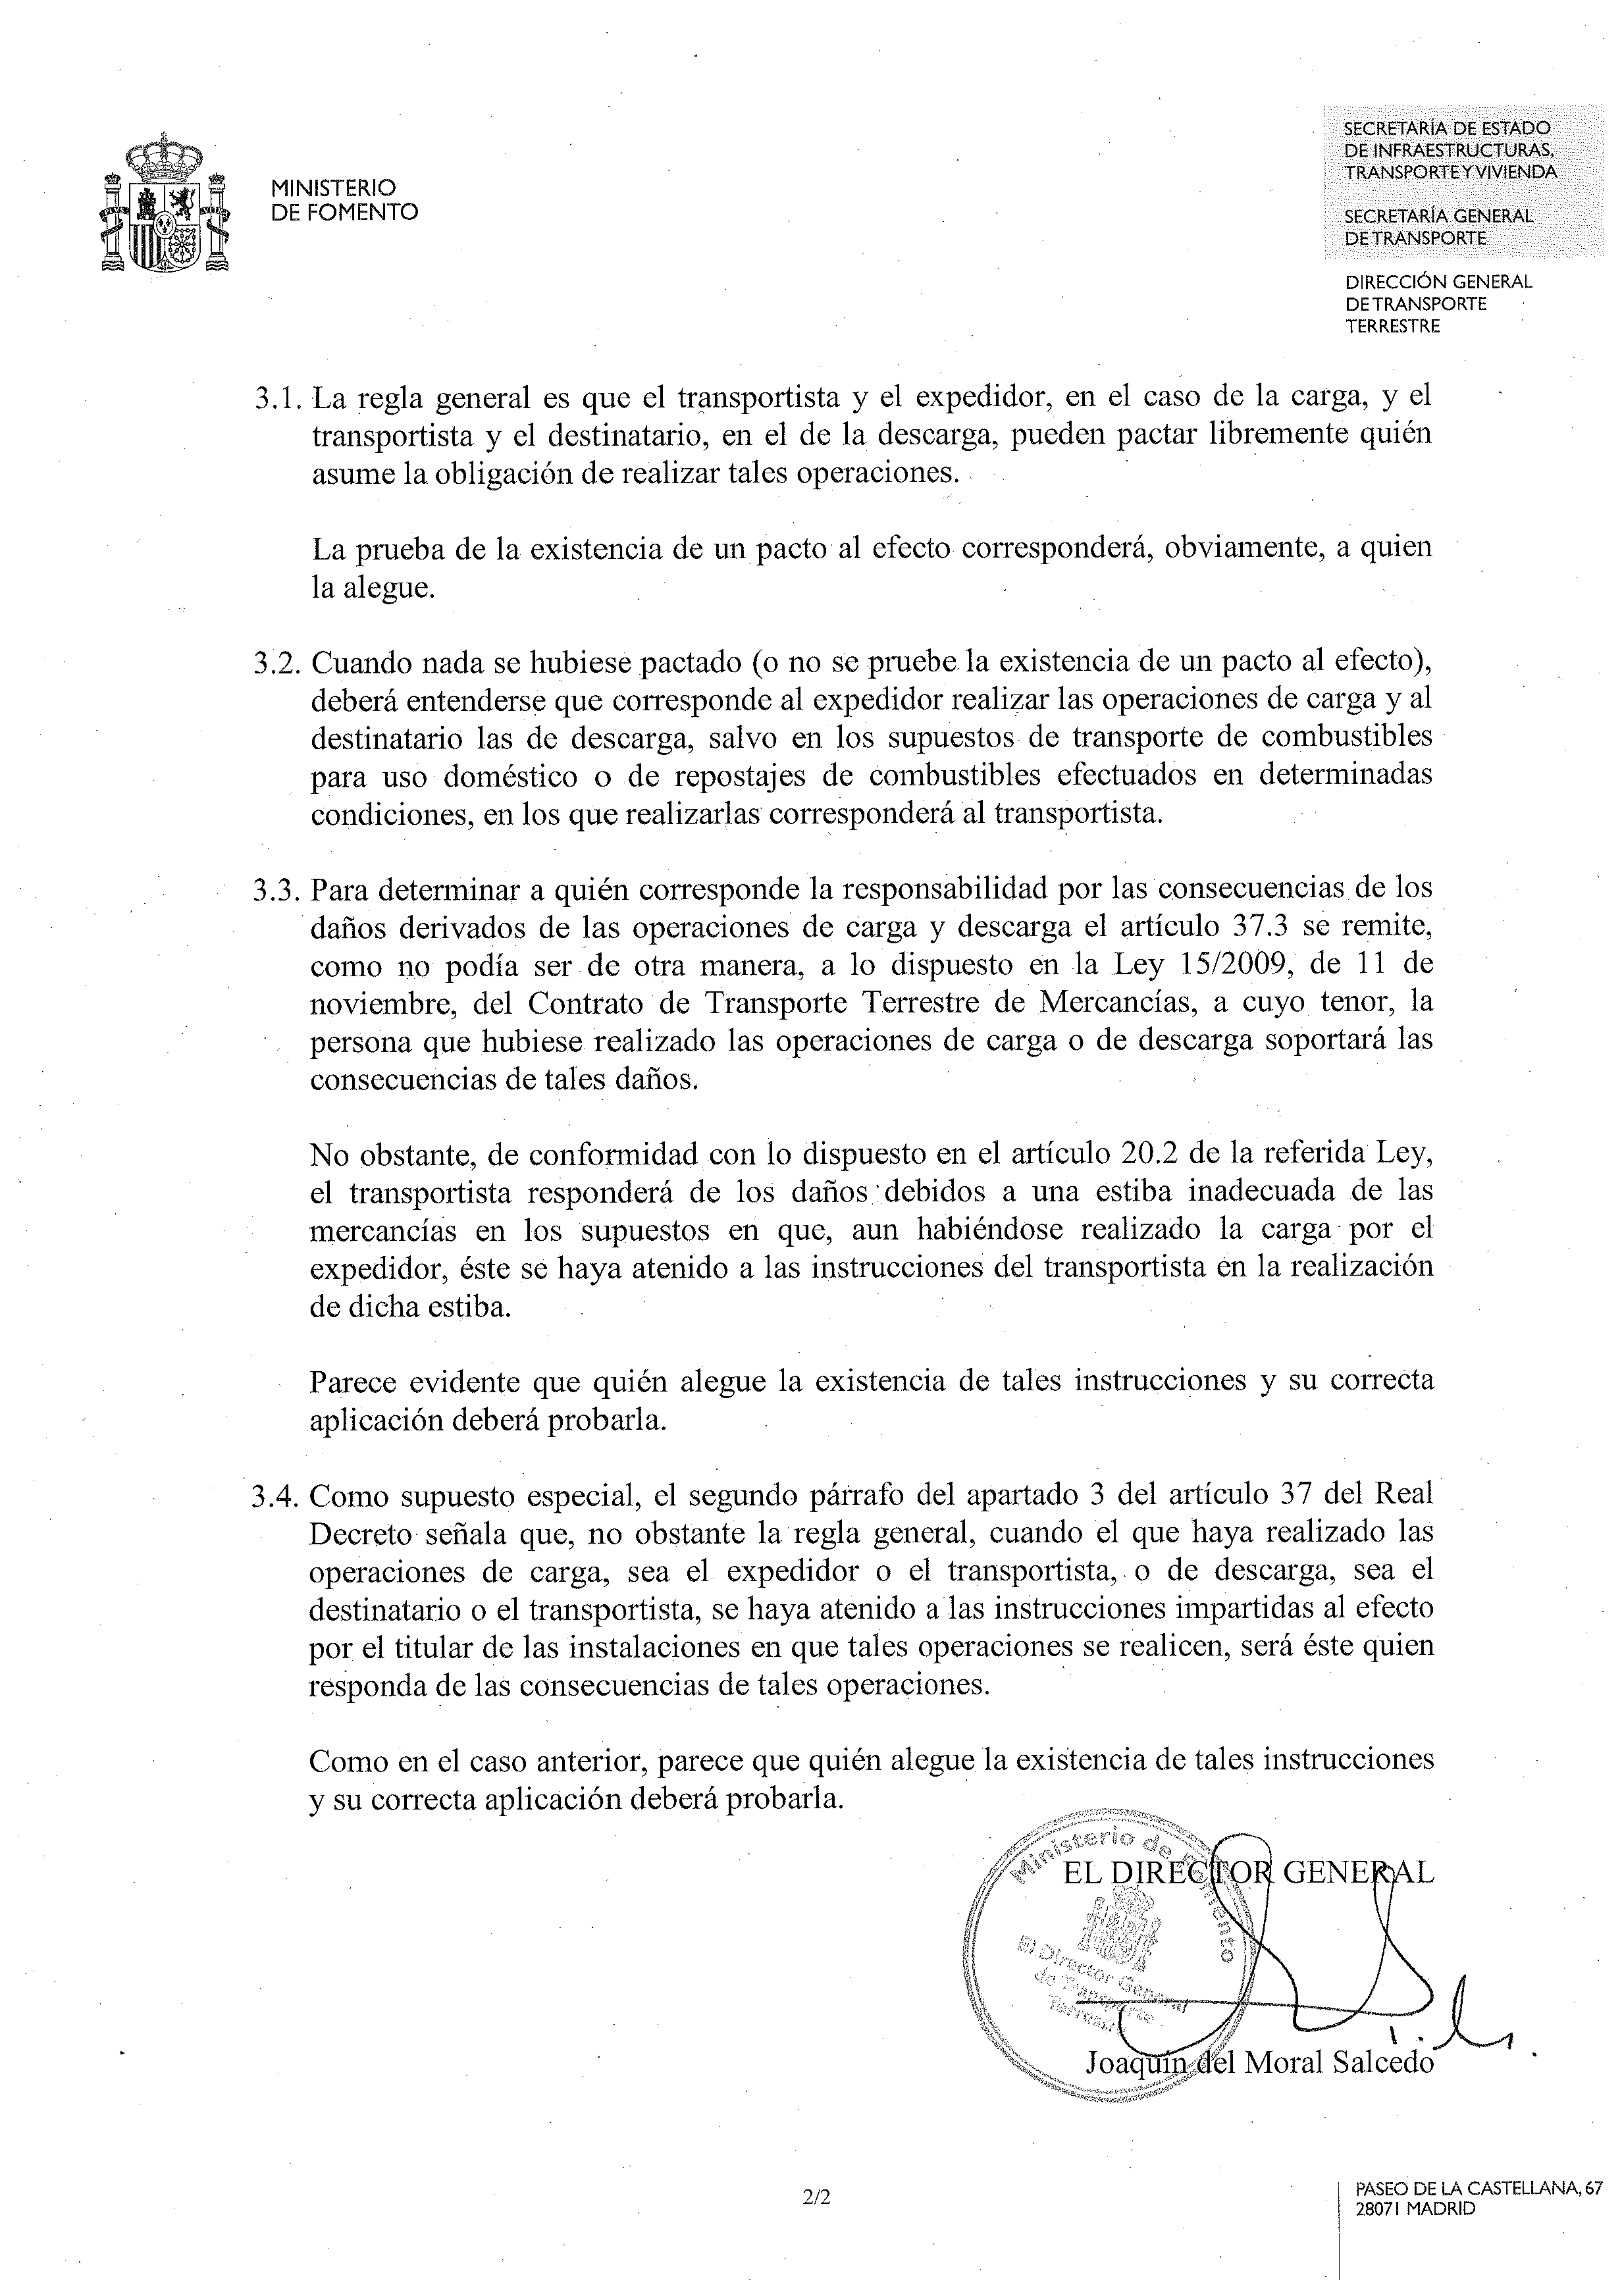 interpretacion-ministerio-fomento-definicion-cargador-descargador-rd97-pagina-2